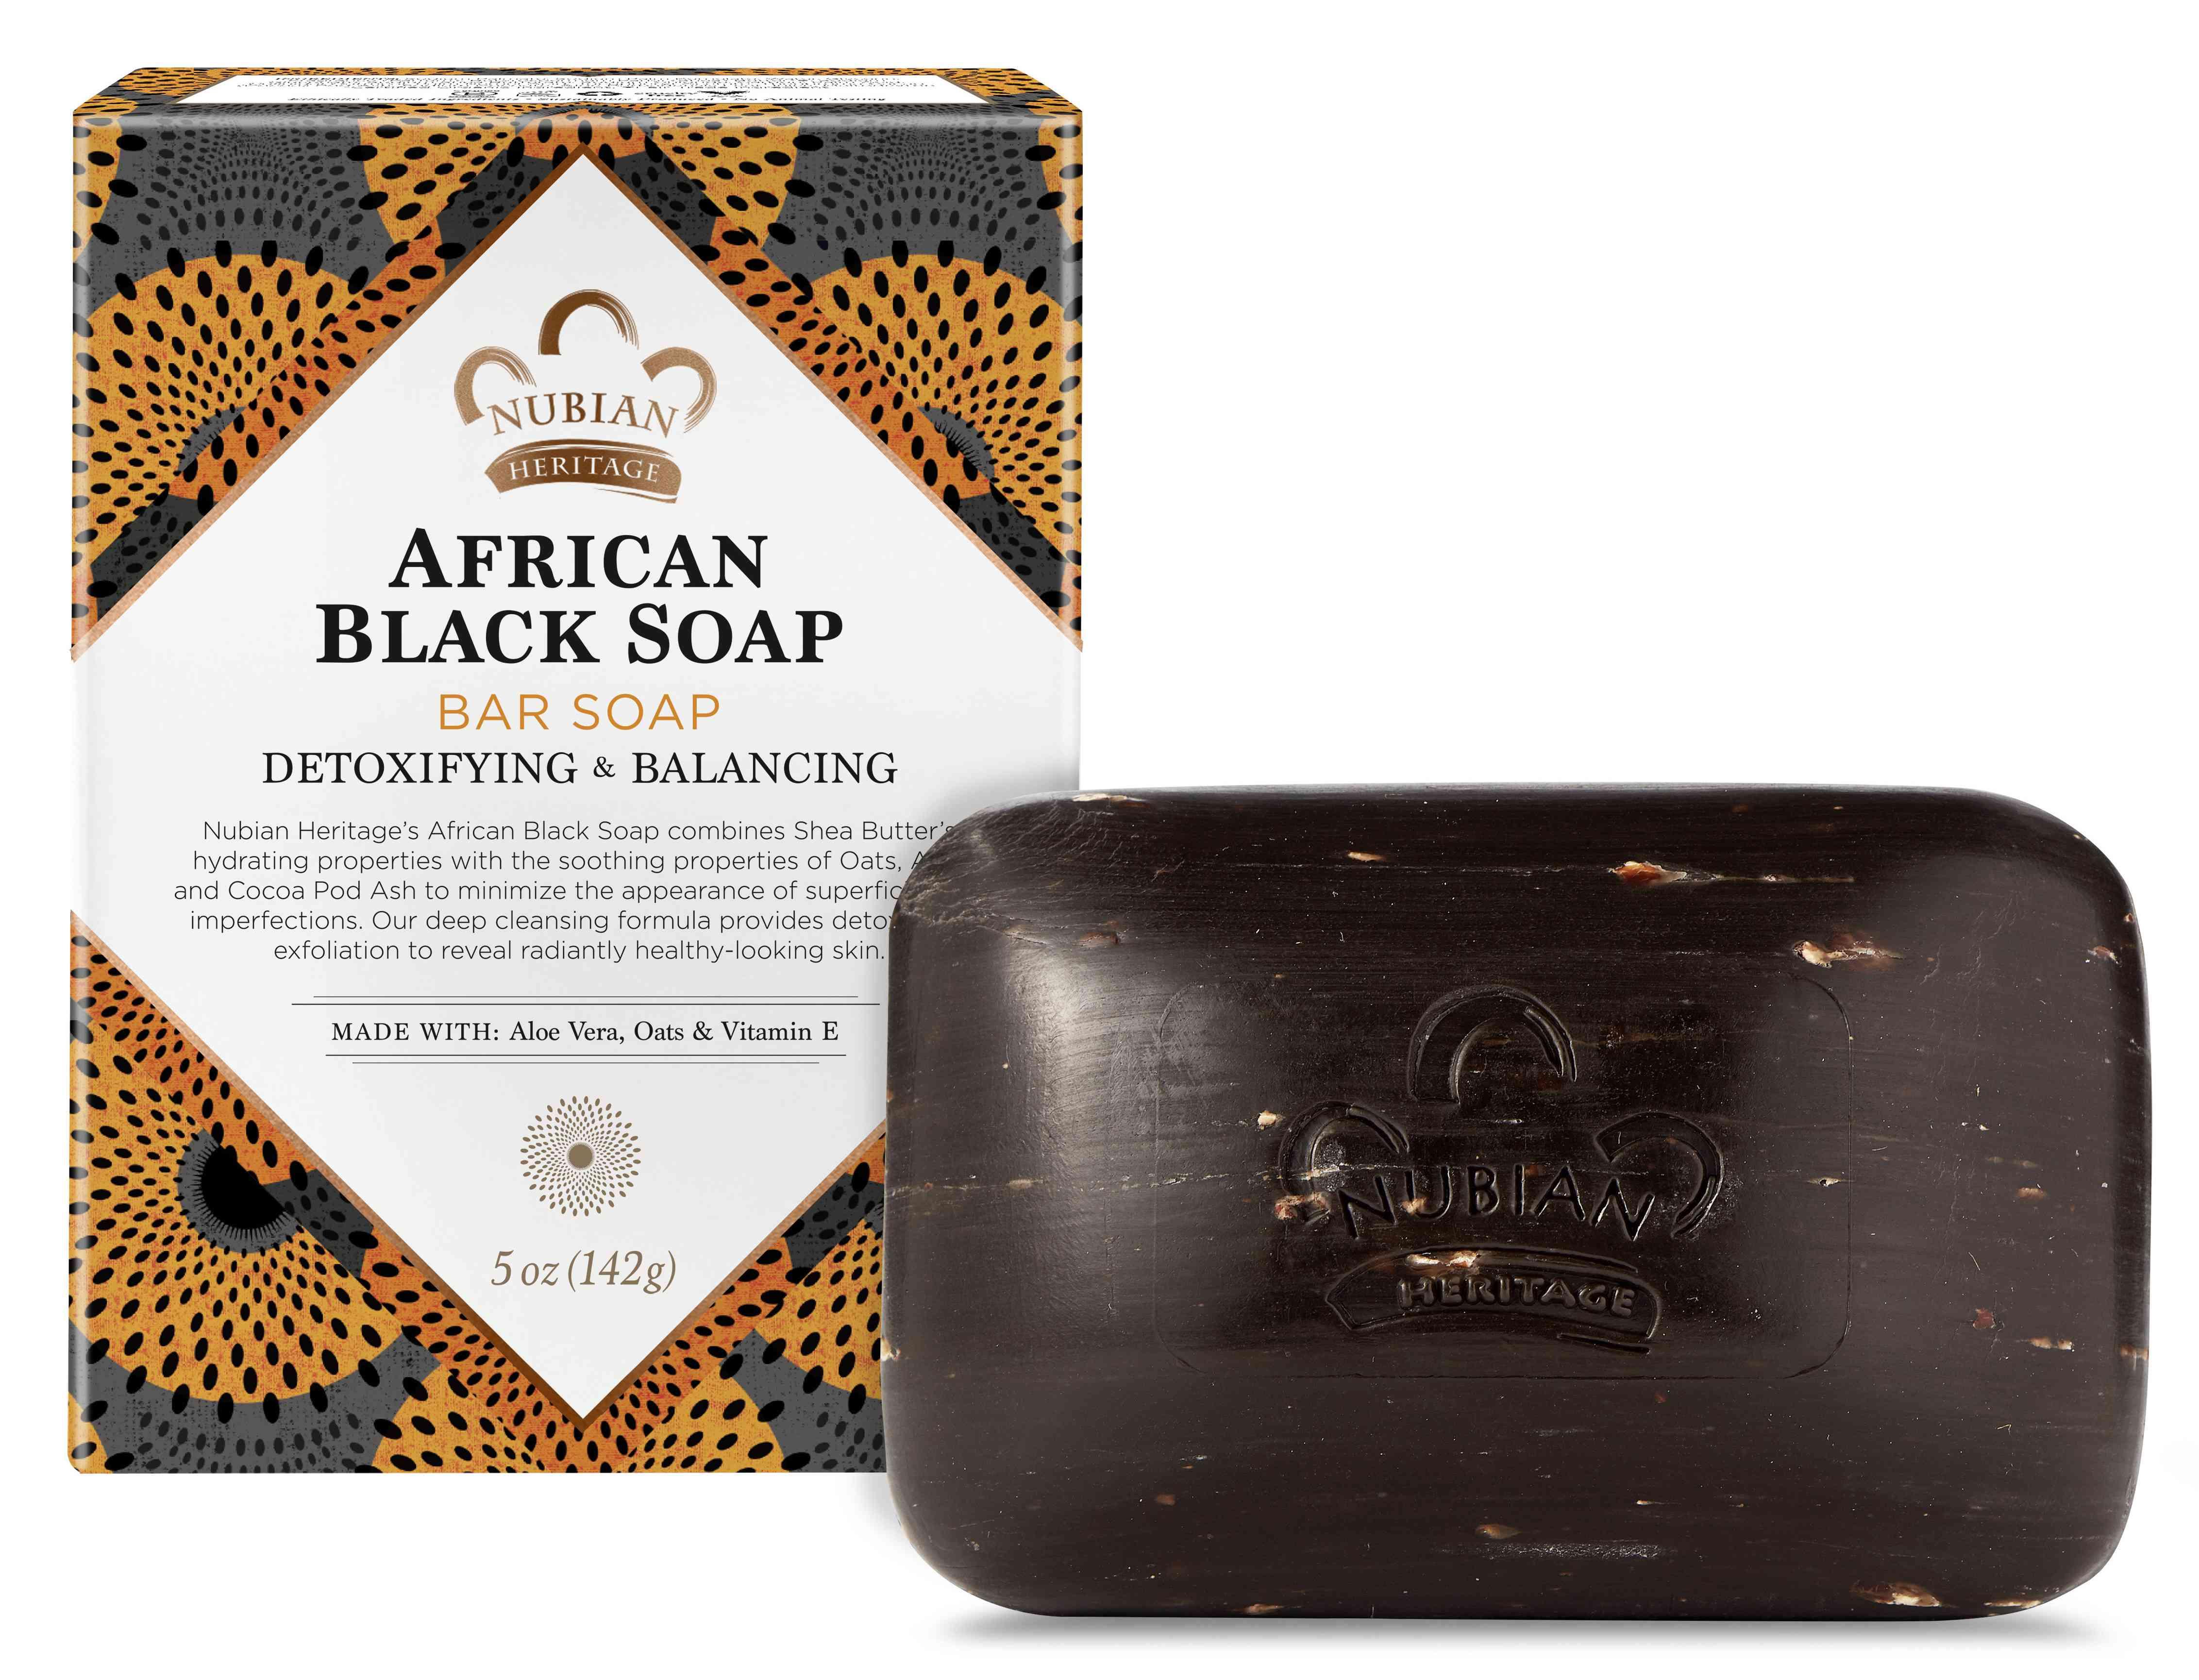 Nubian Heritage African Black Soap Bar